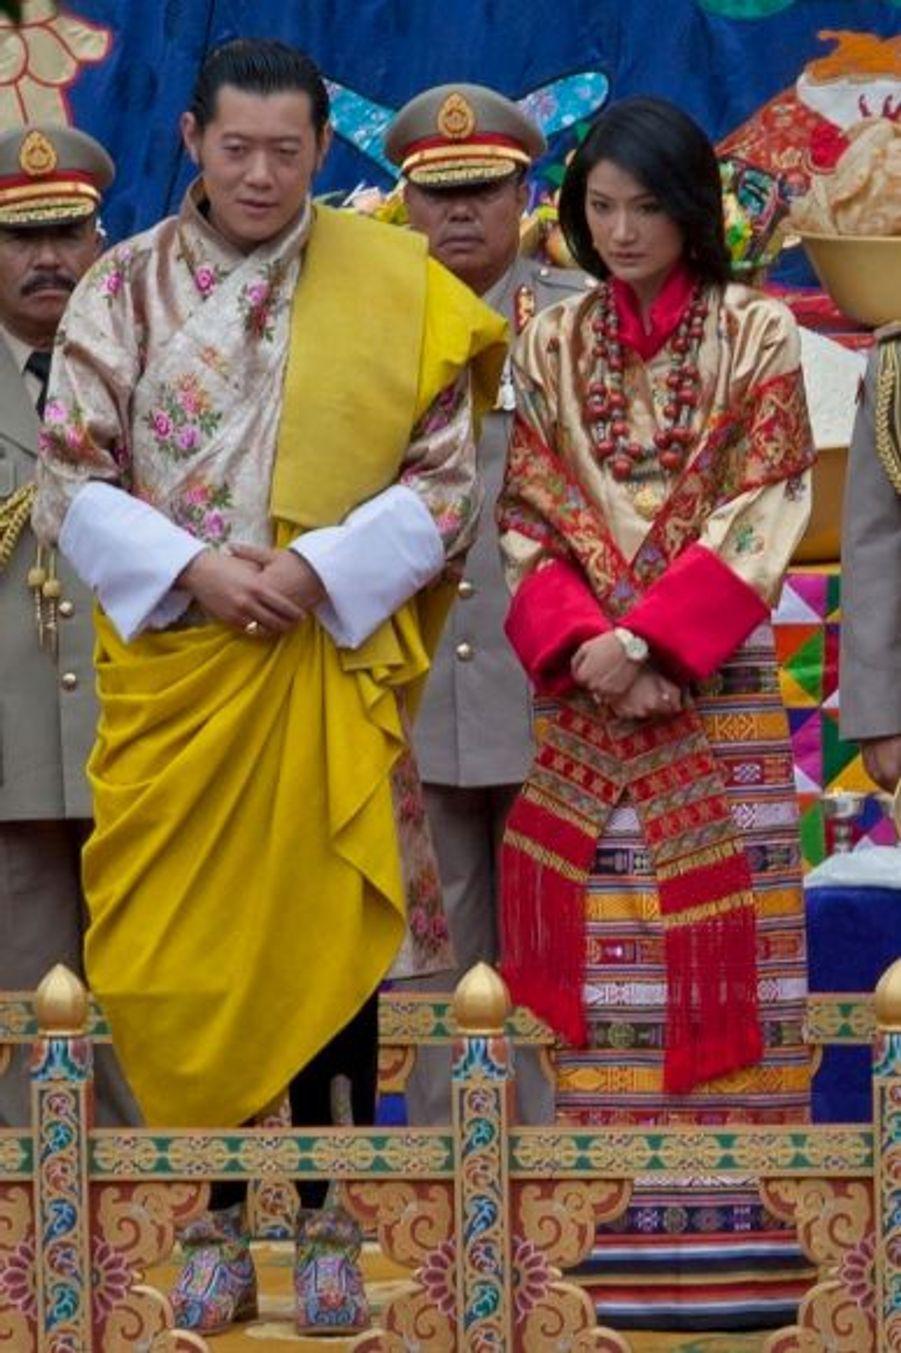 En habits traditionnels